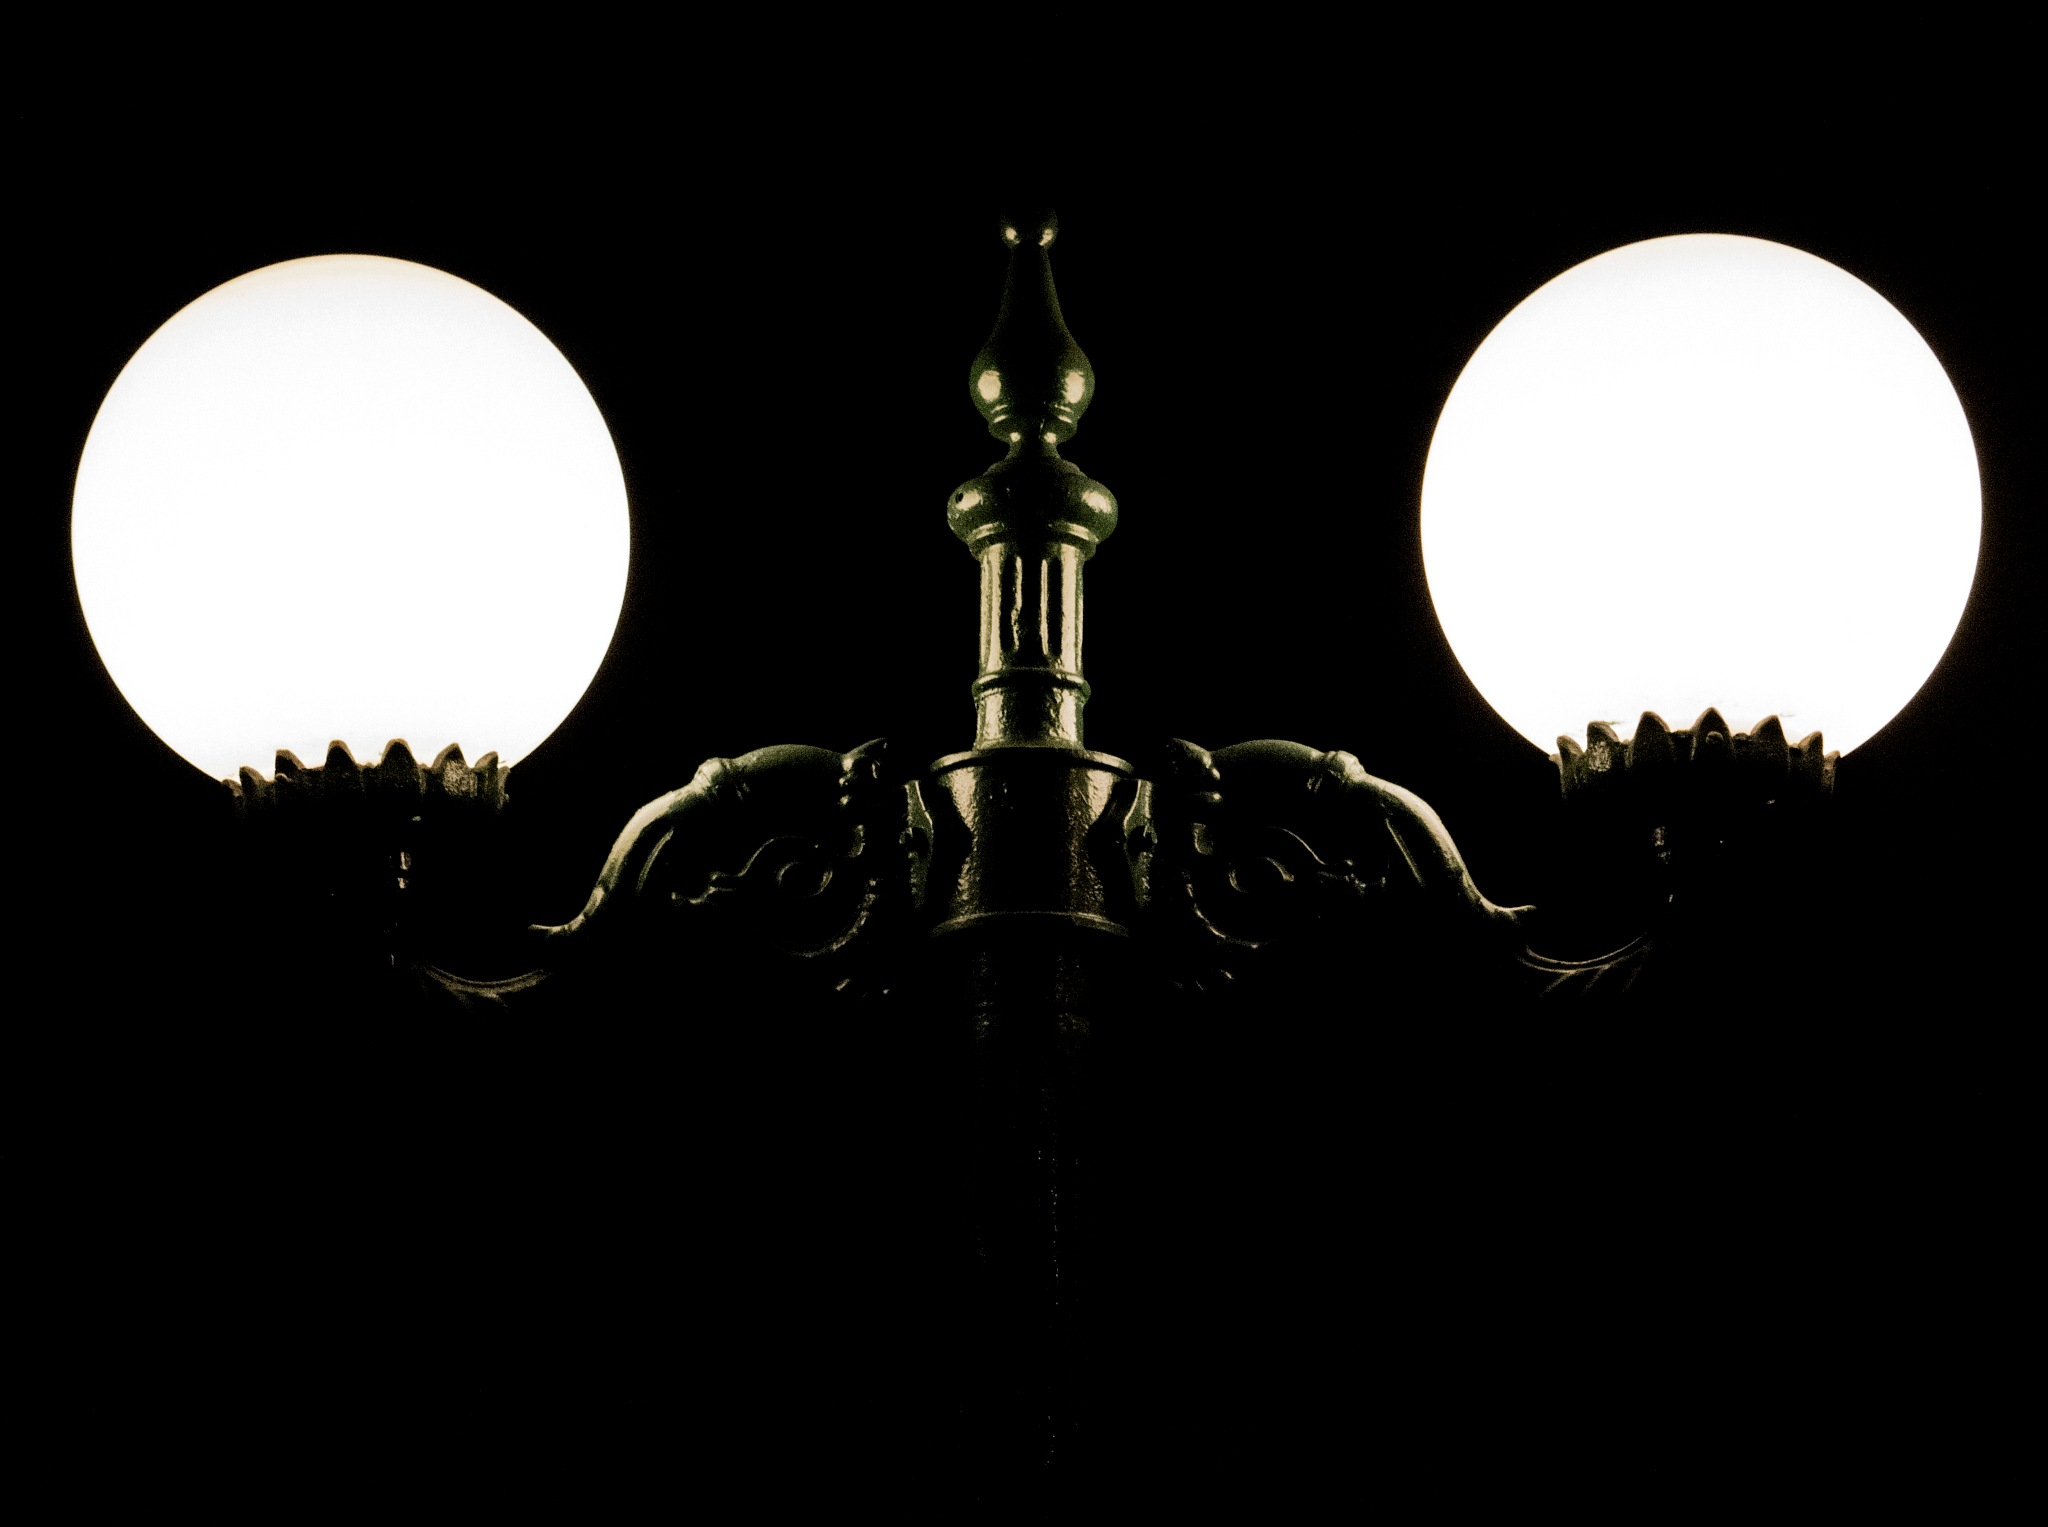 Citizen Light by Phsepulveda